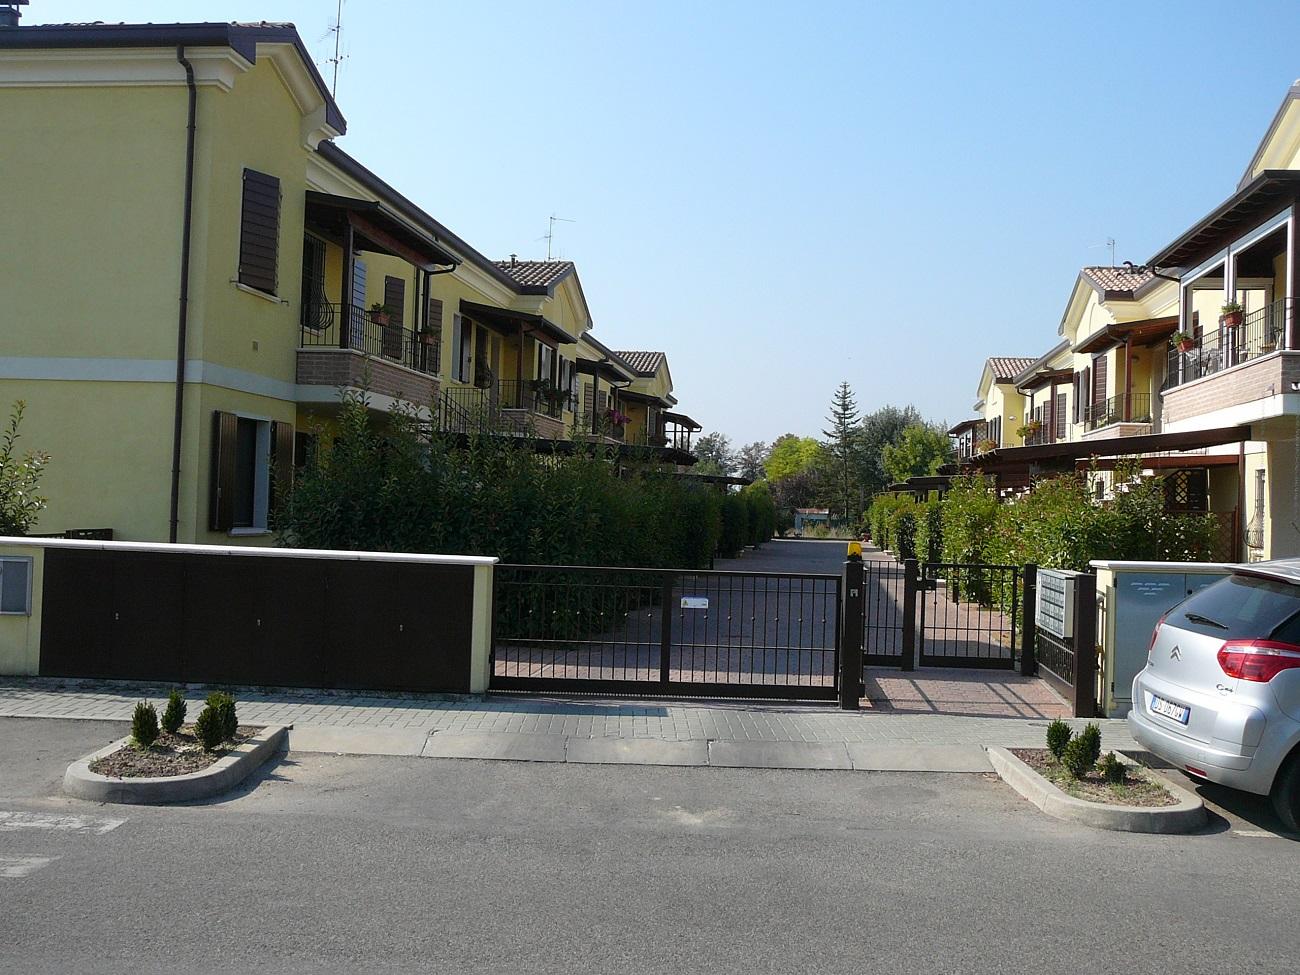 San Pancrazio - Via Fratelli Garavini